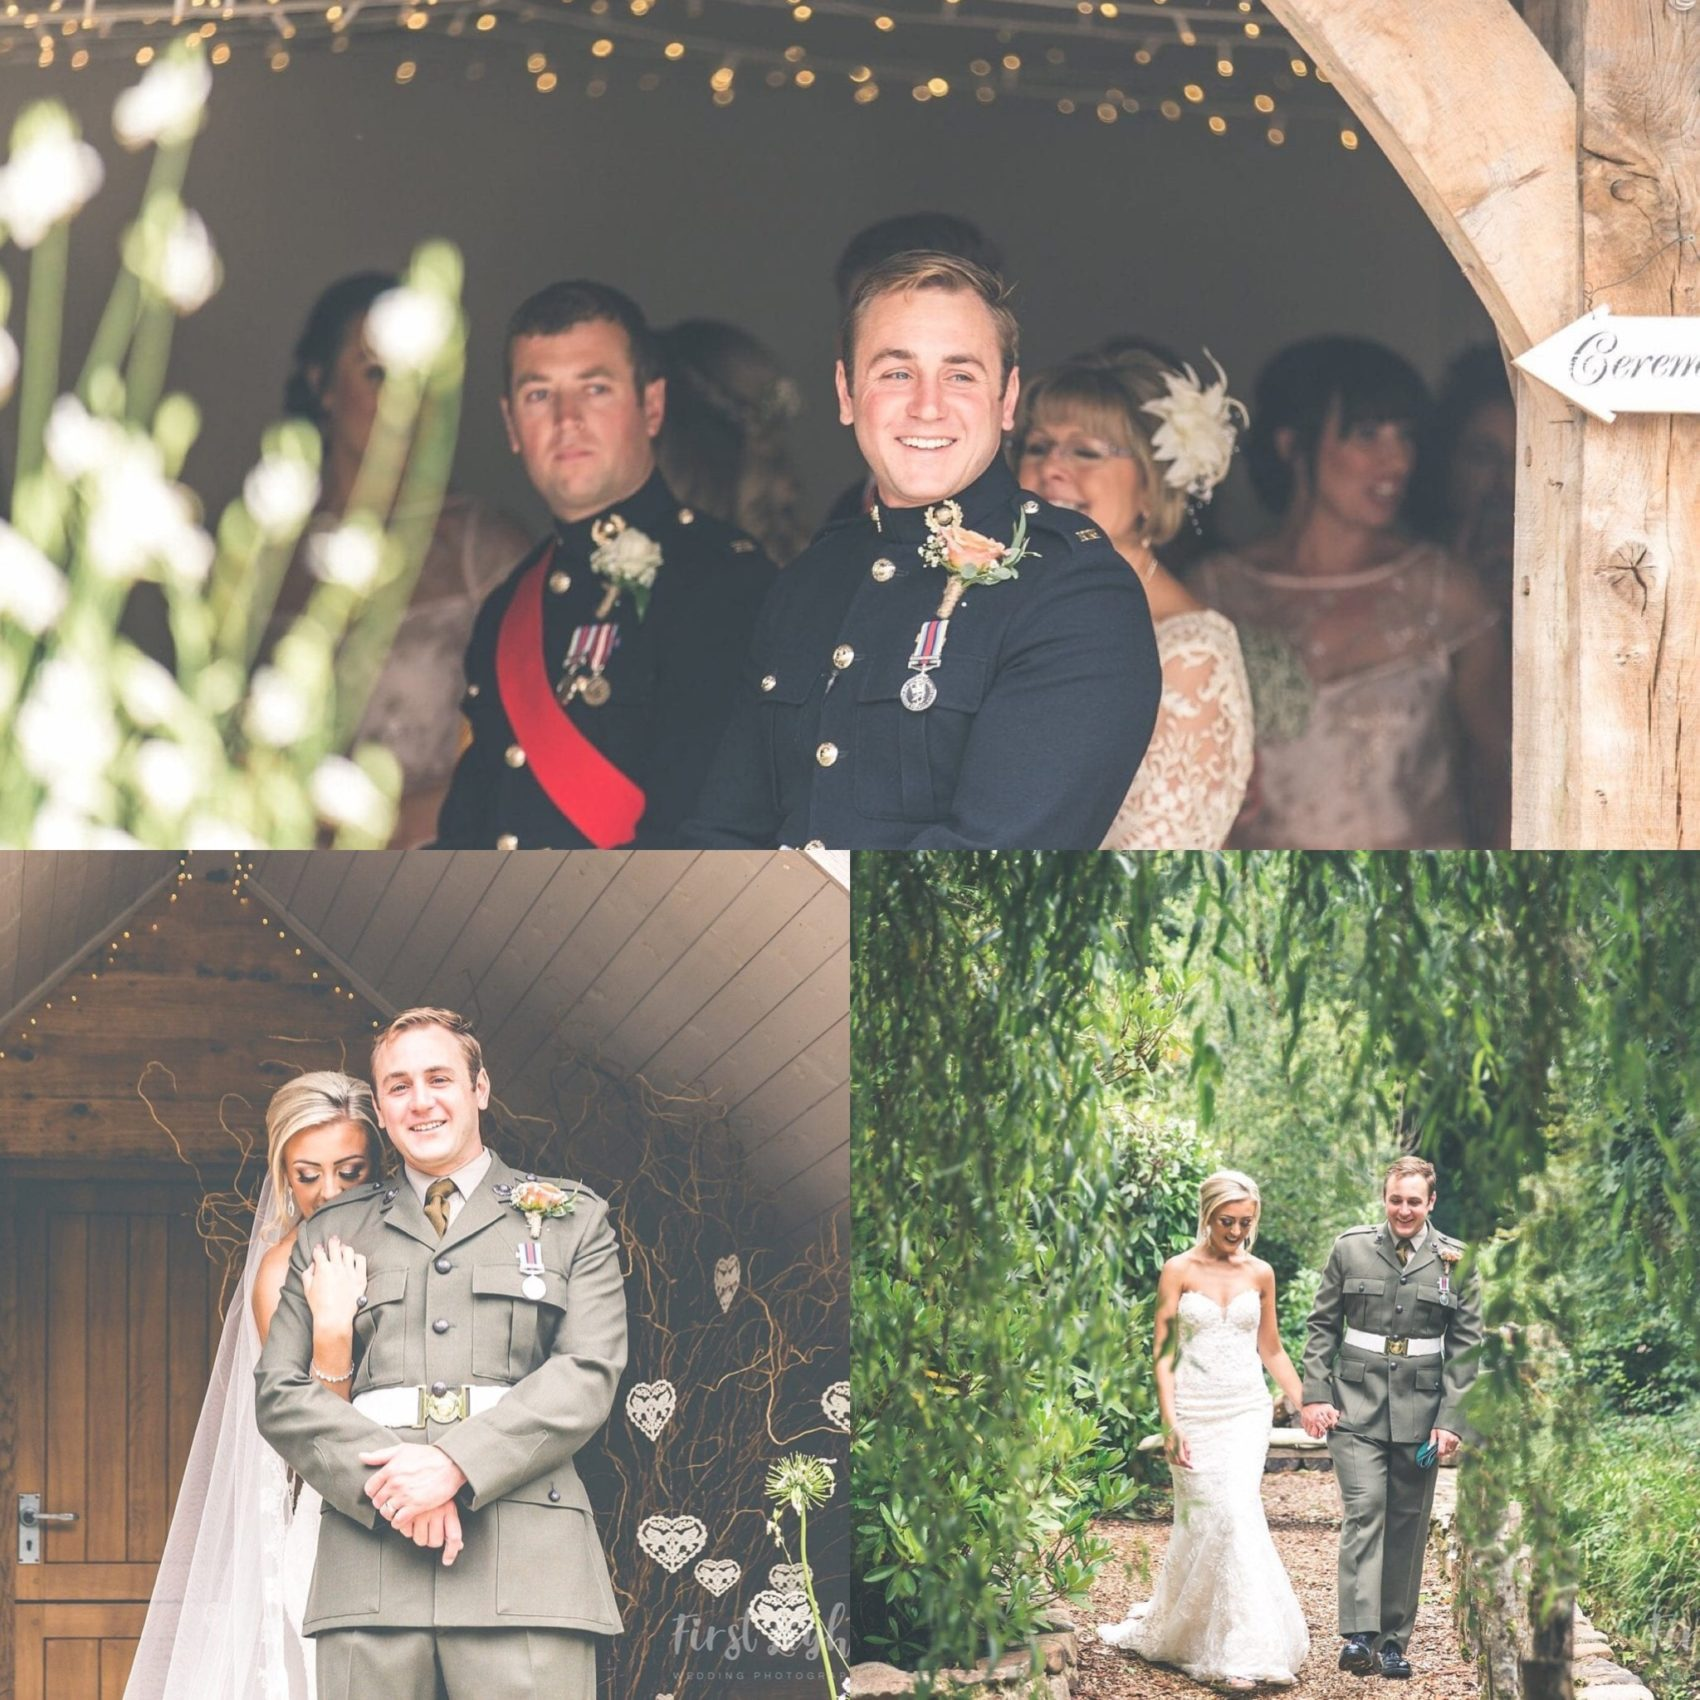 first light, light, airy, bright, filter, woodland, perspective, fairy lights, uniform, love, couple, bride & Groom,